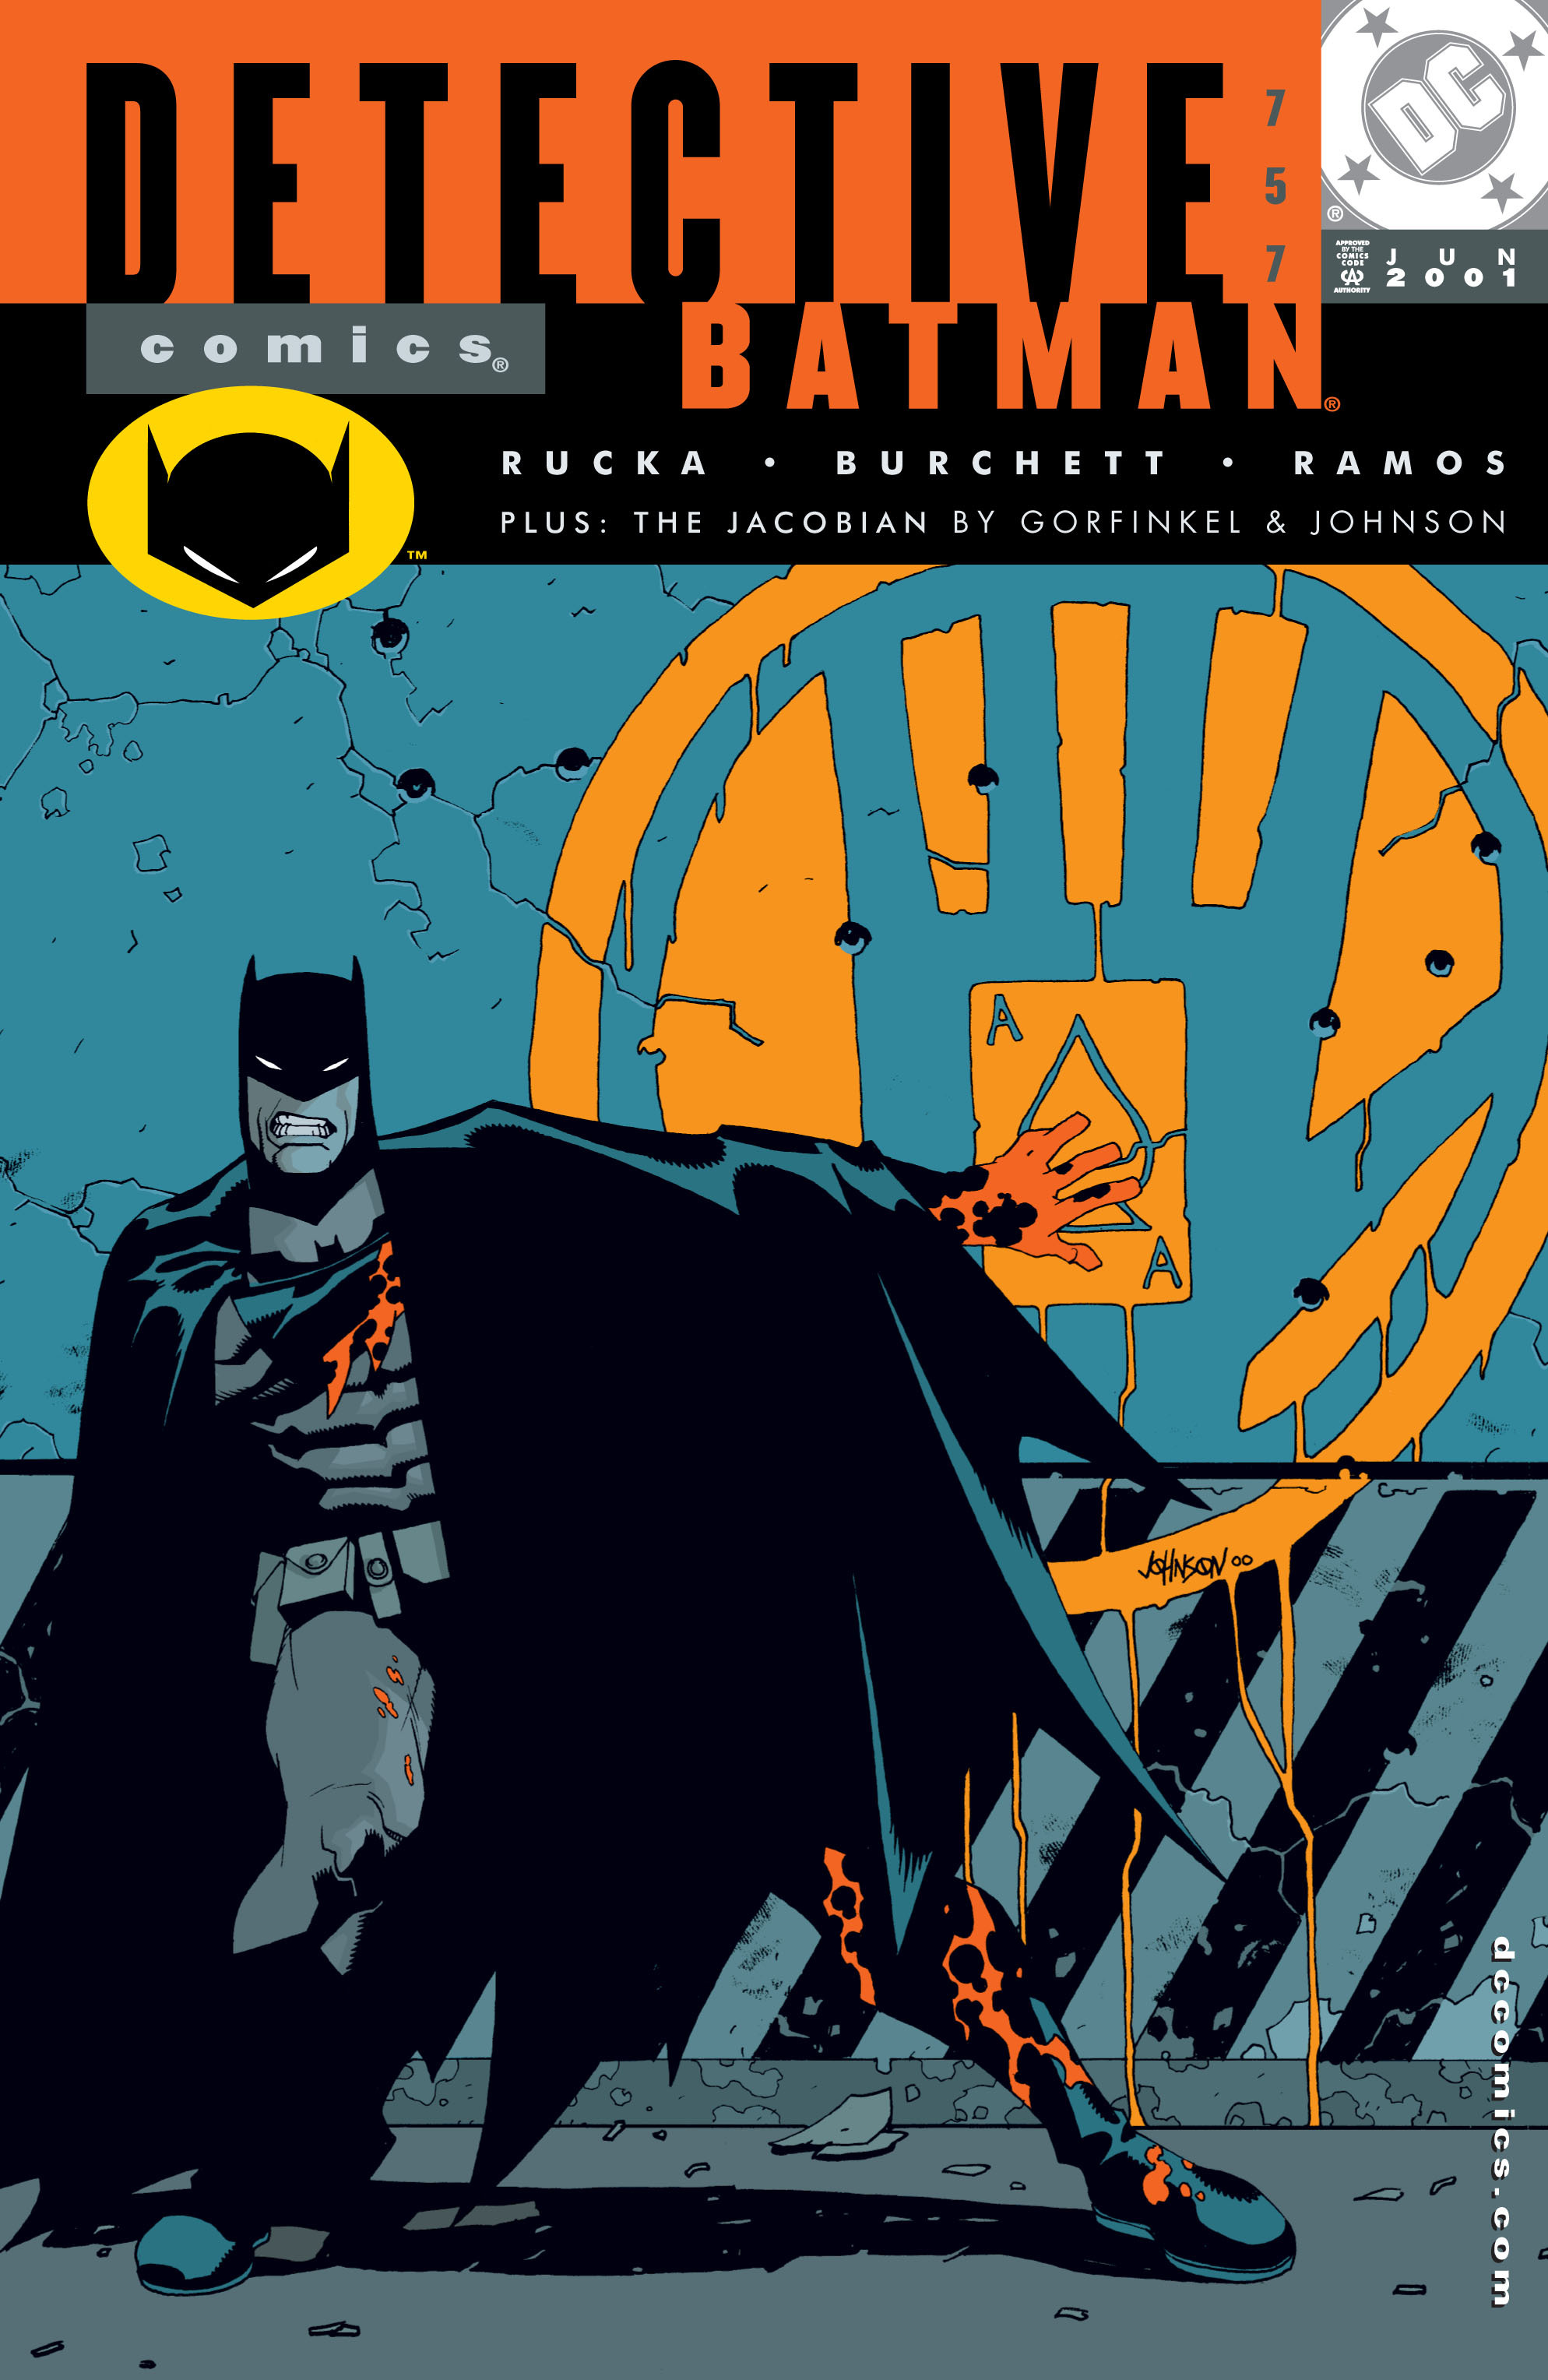 Detective Comics (1937) 757 Page 0